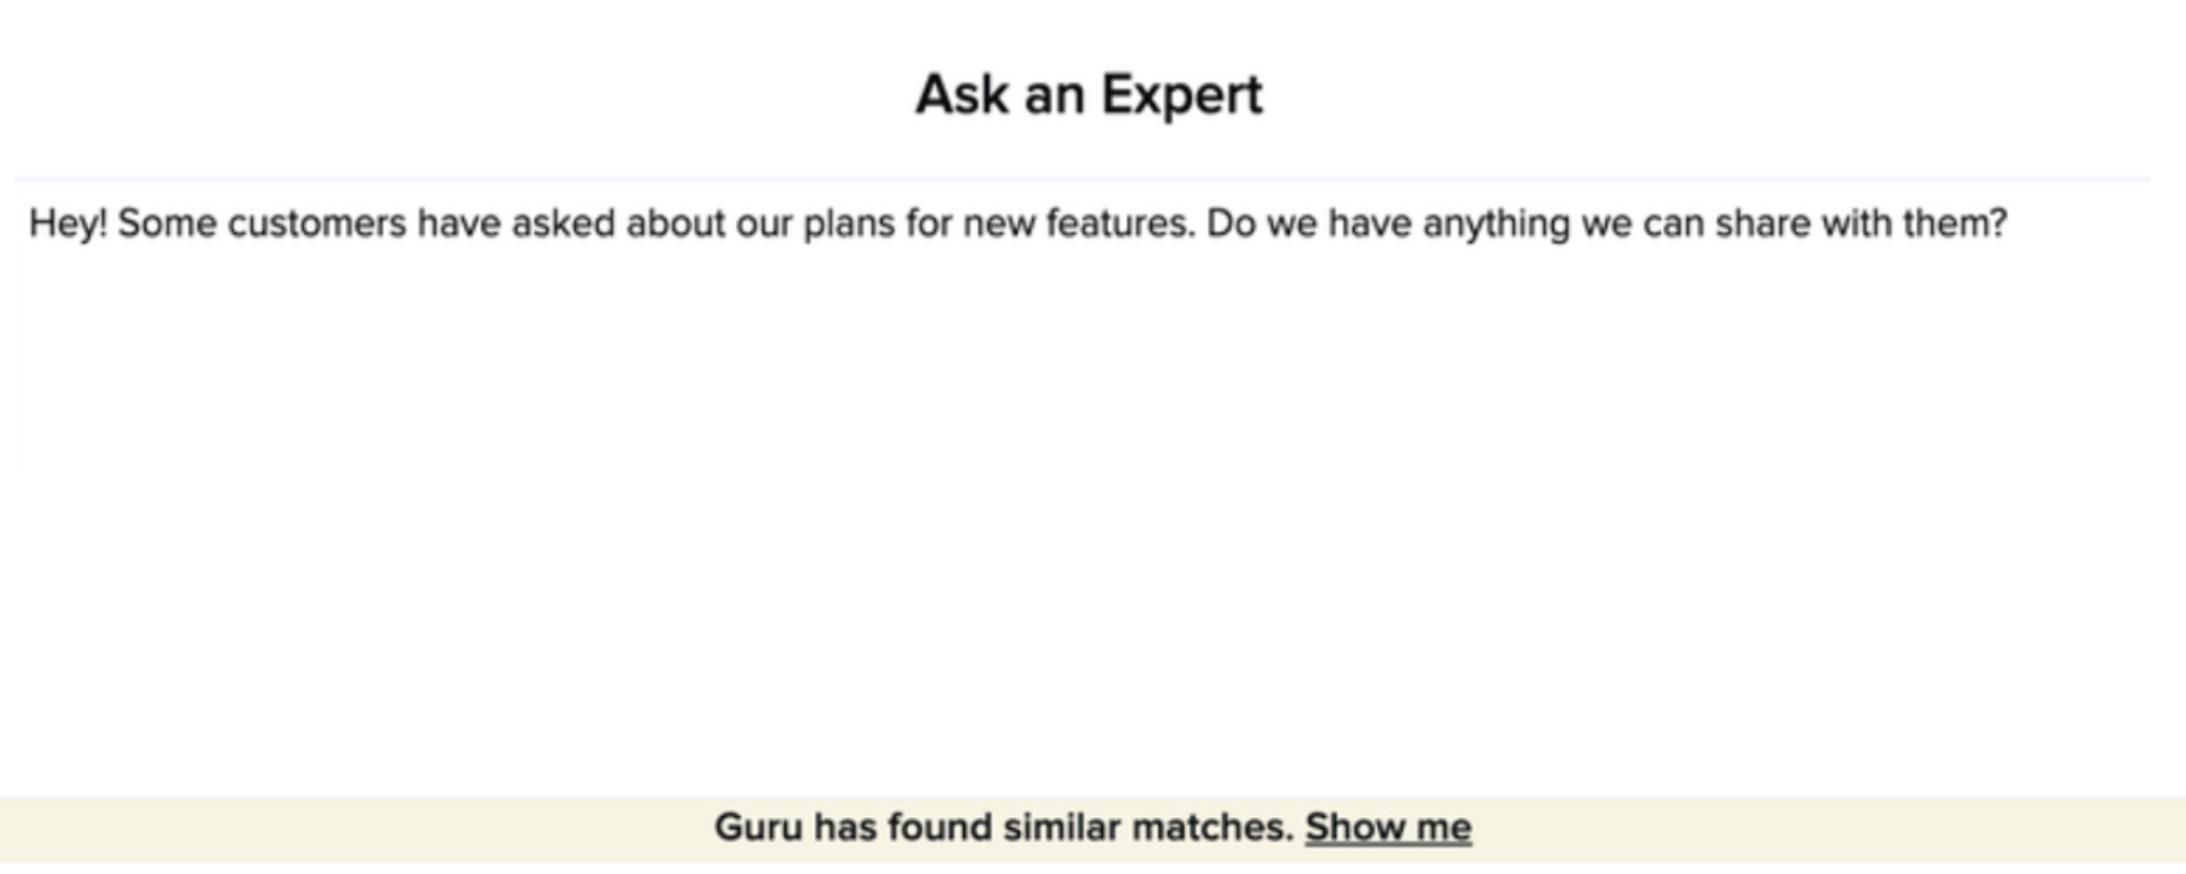 ask an expert - asking a question.